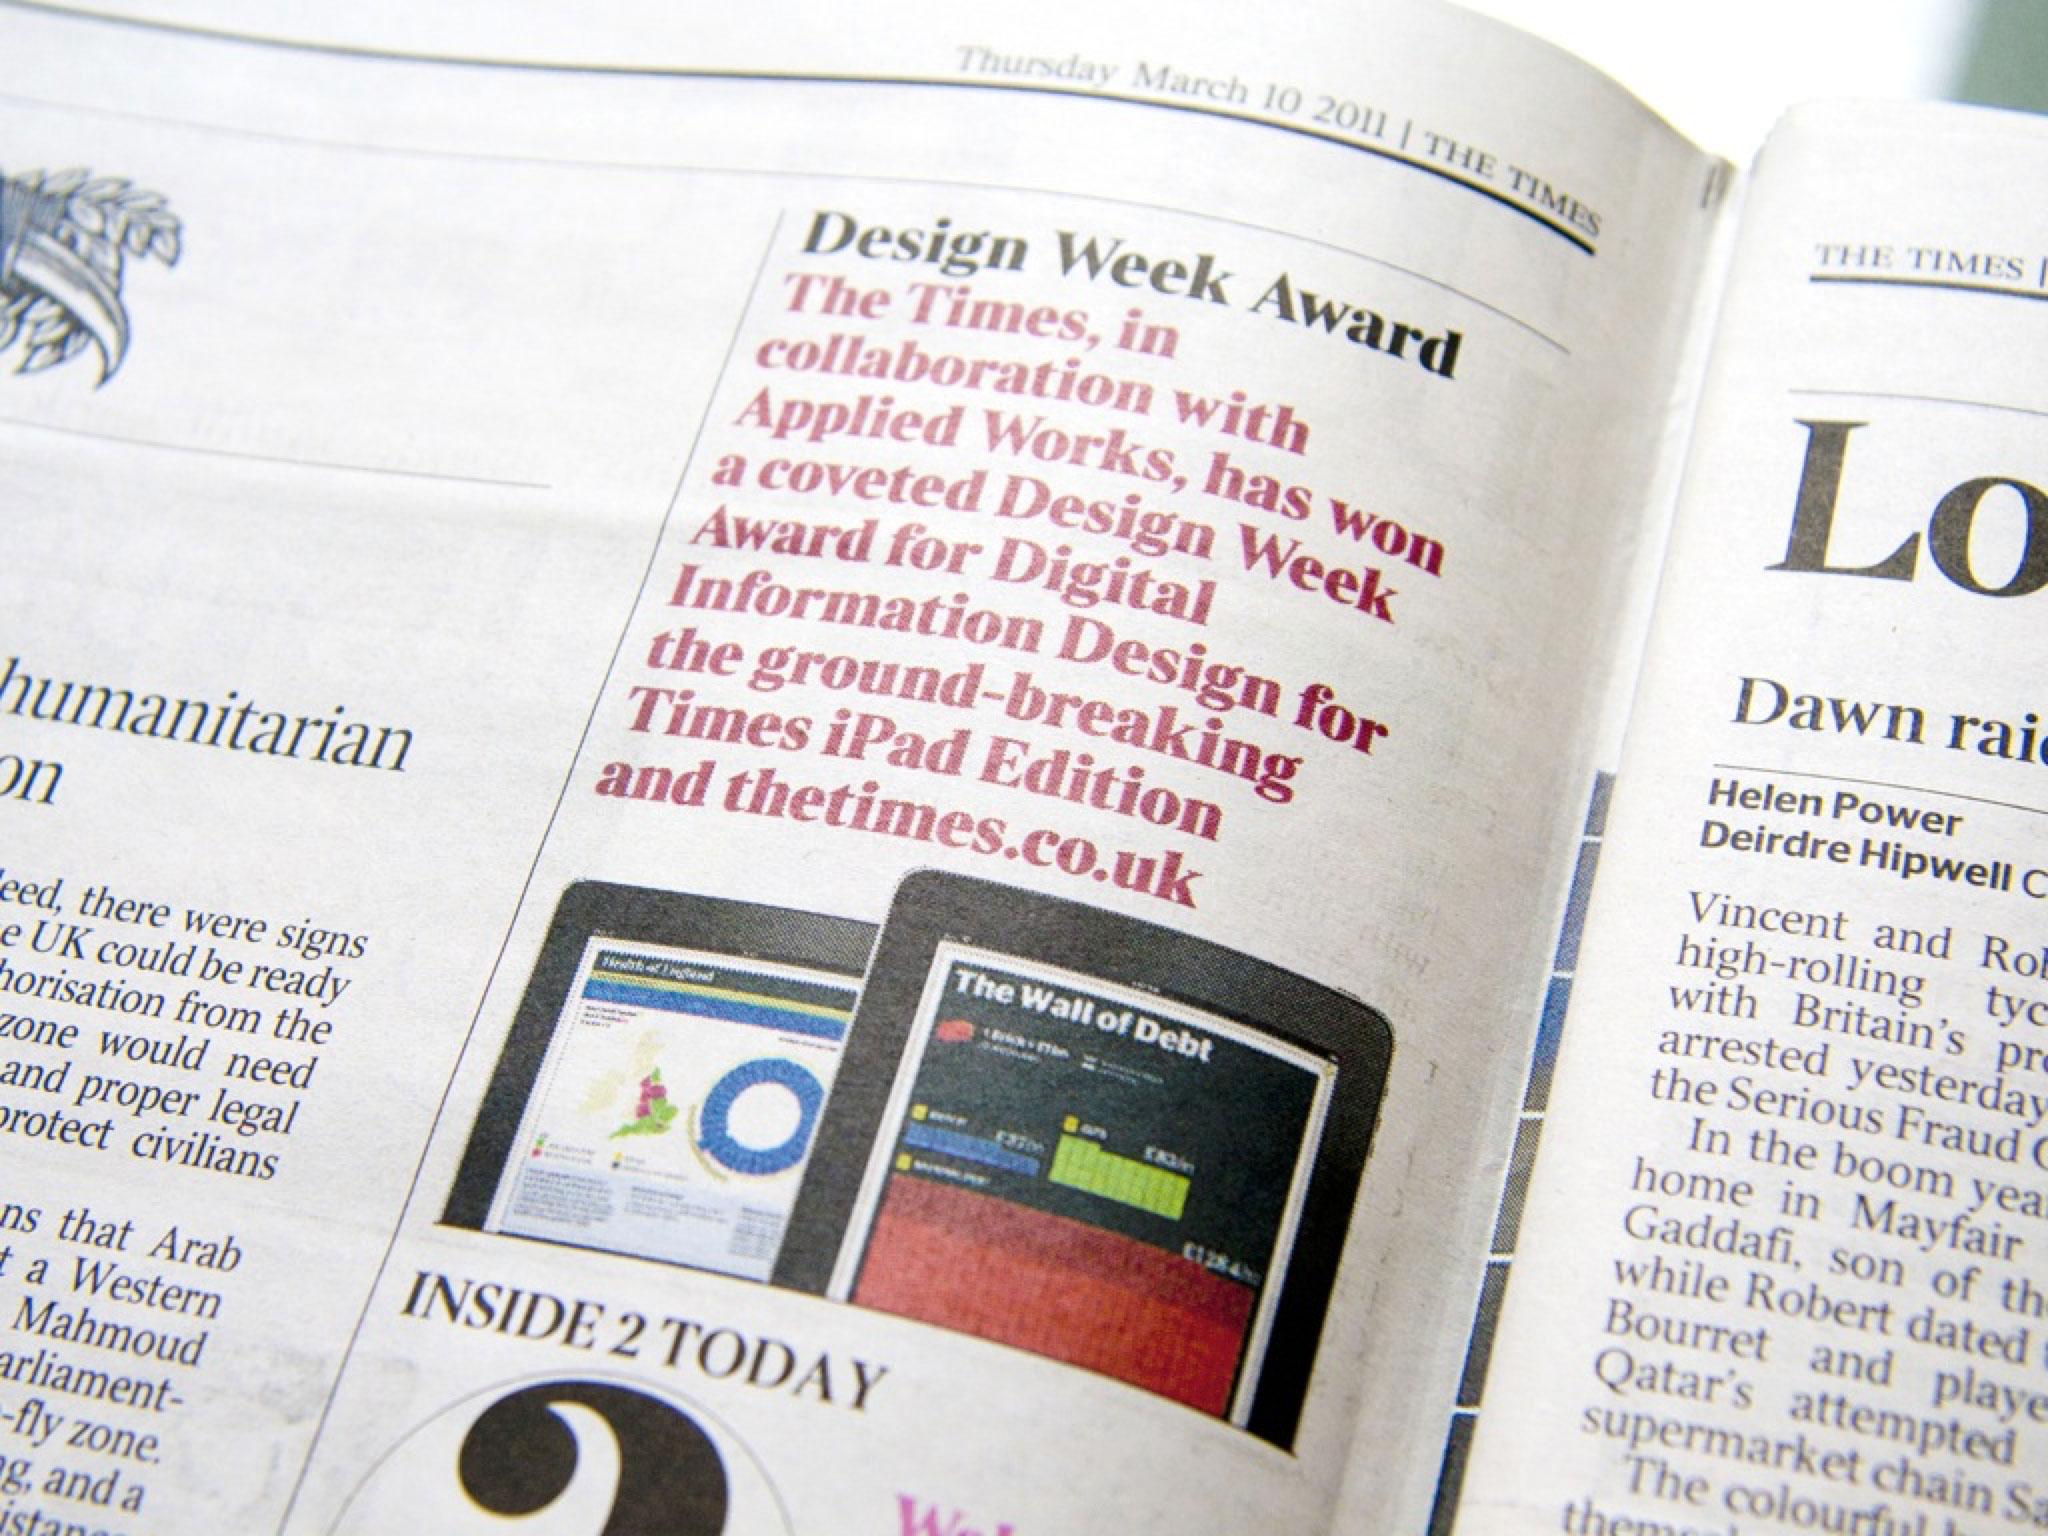 The Times Design Week Award